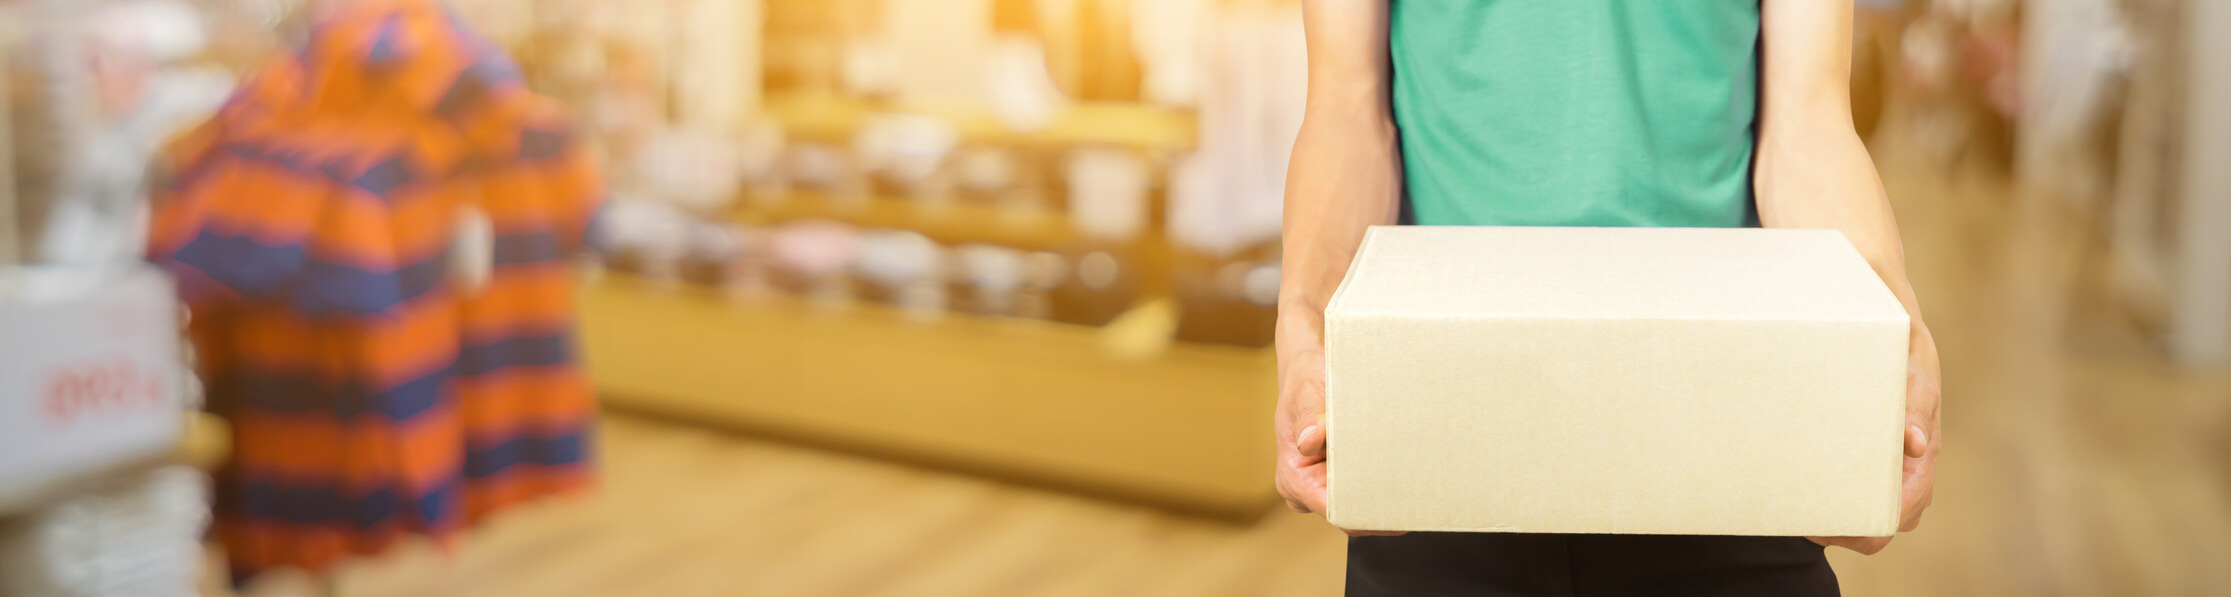 ratgeber bei otto ger te leihen so funktioniert ottonow. Black Bedroom Furniture Sets. Home Design Ideas